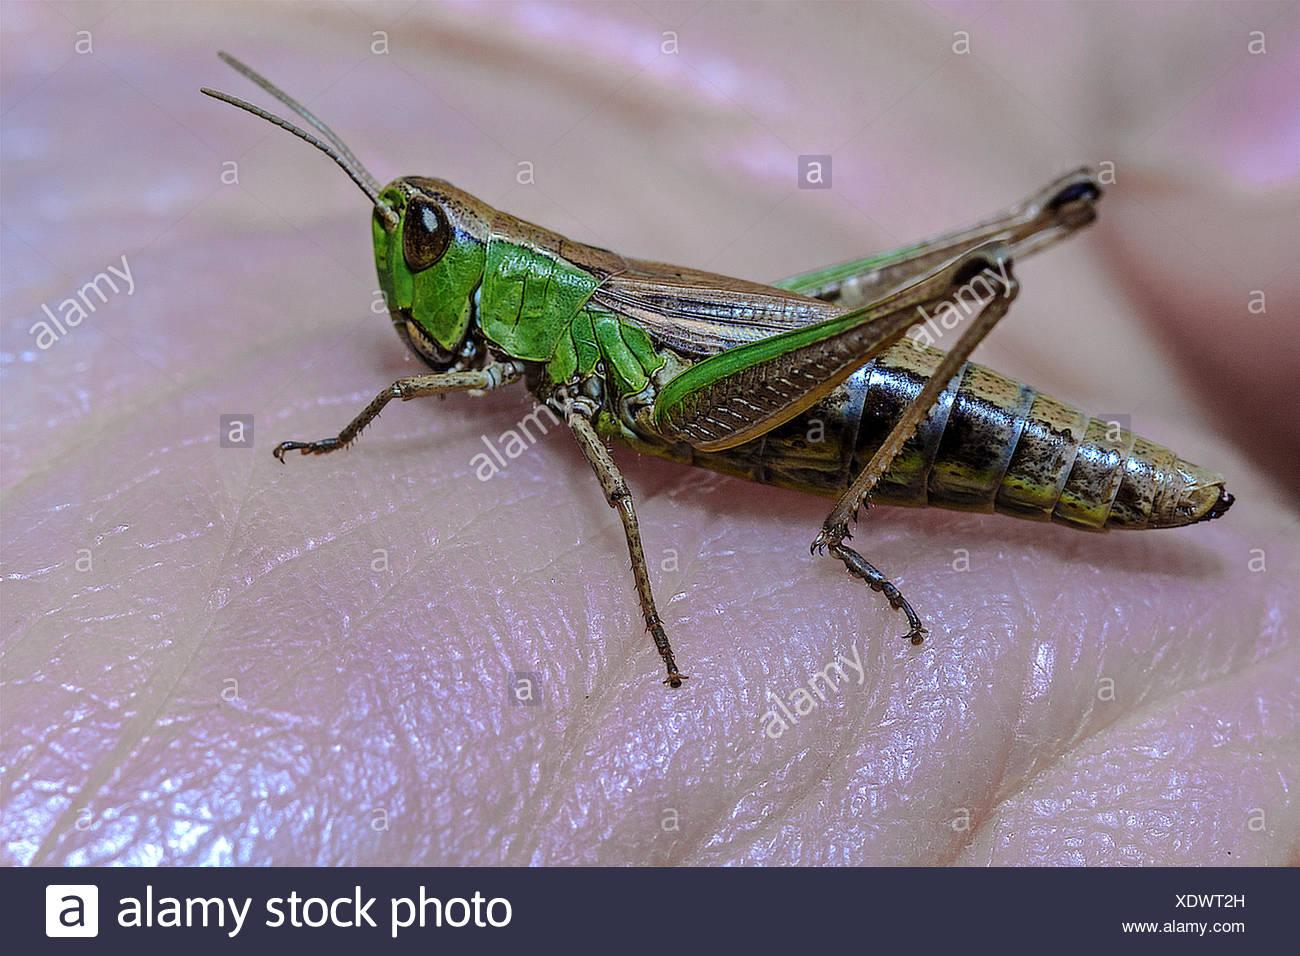 Green Grasshopper (Omocestus viridulus) On A hand - Stock Image